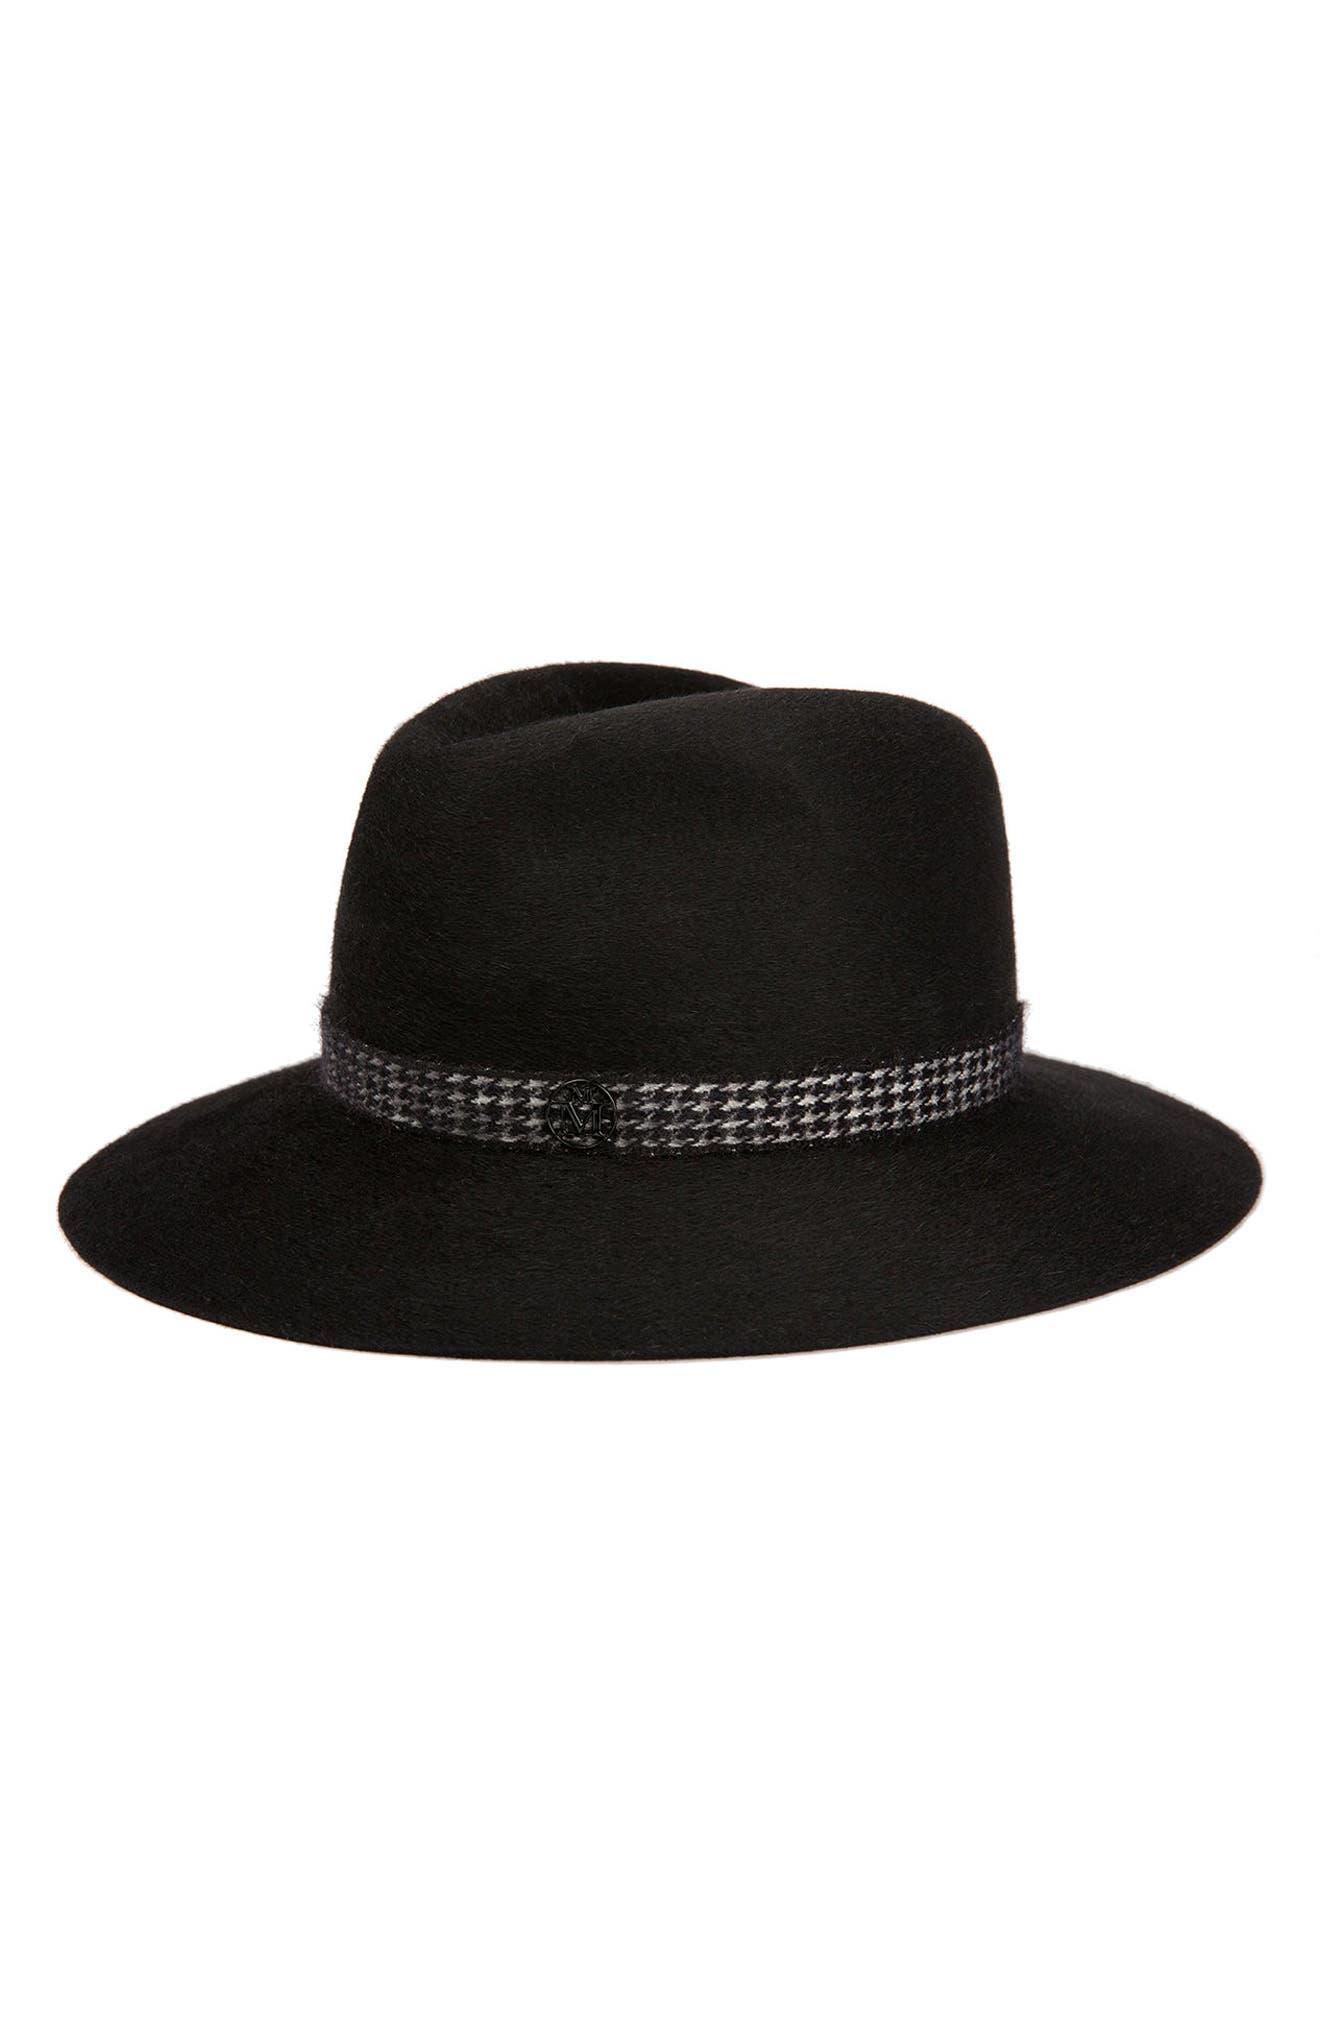 Henrietta Fur Felt Hat,                             Main thumbnail 1, color,                             BLACK